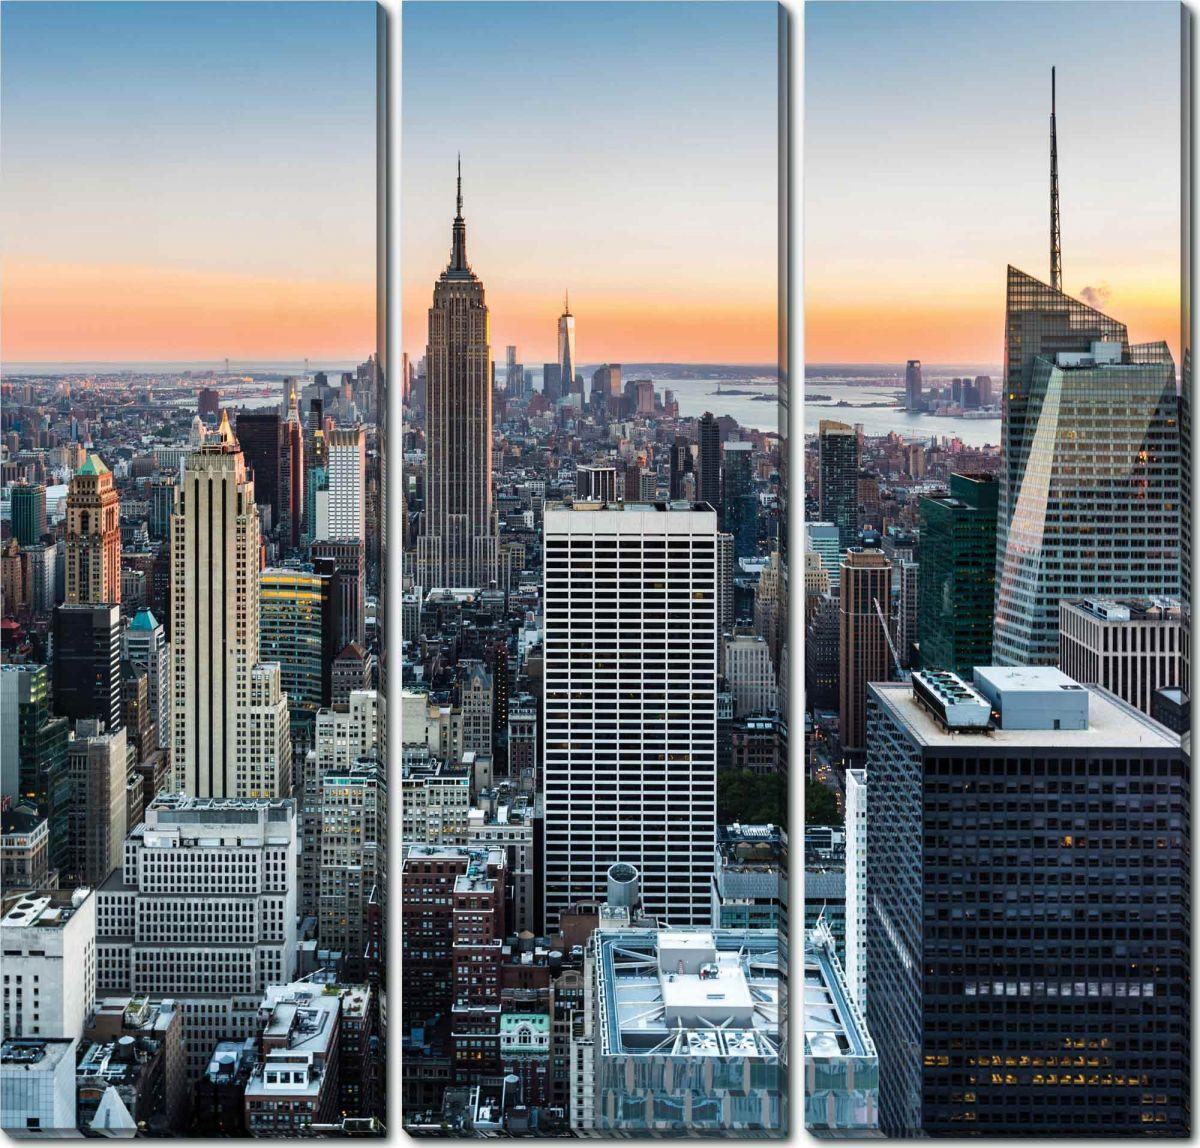 Модульная картина на холсте 90x90 Нью йорк вечер Ekoramka HE-107-183 фото